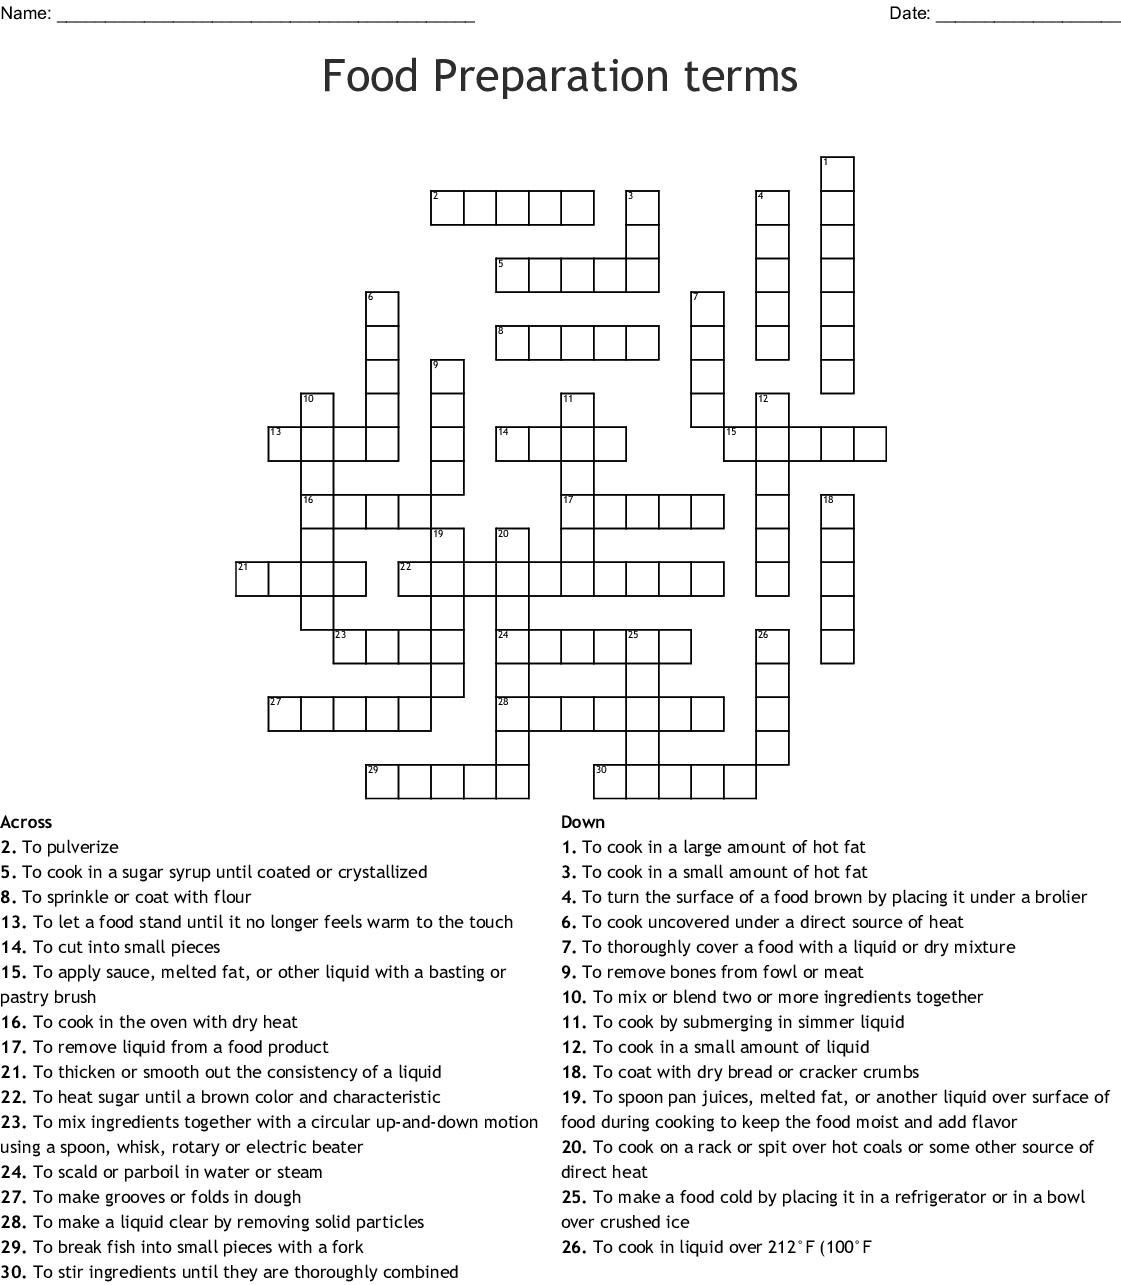 Food Preparation Terms Crossword